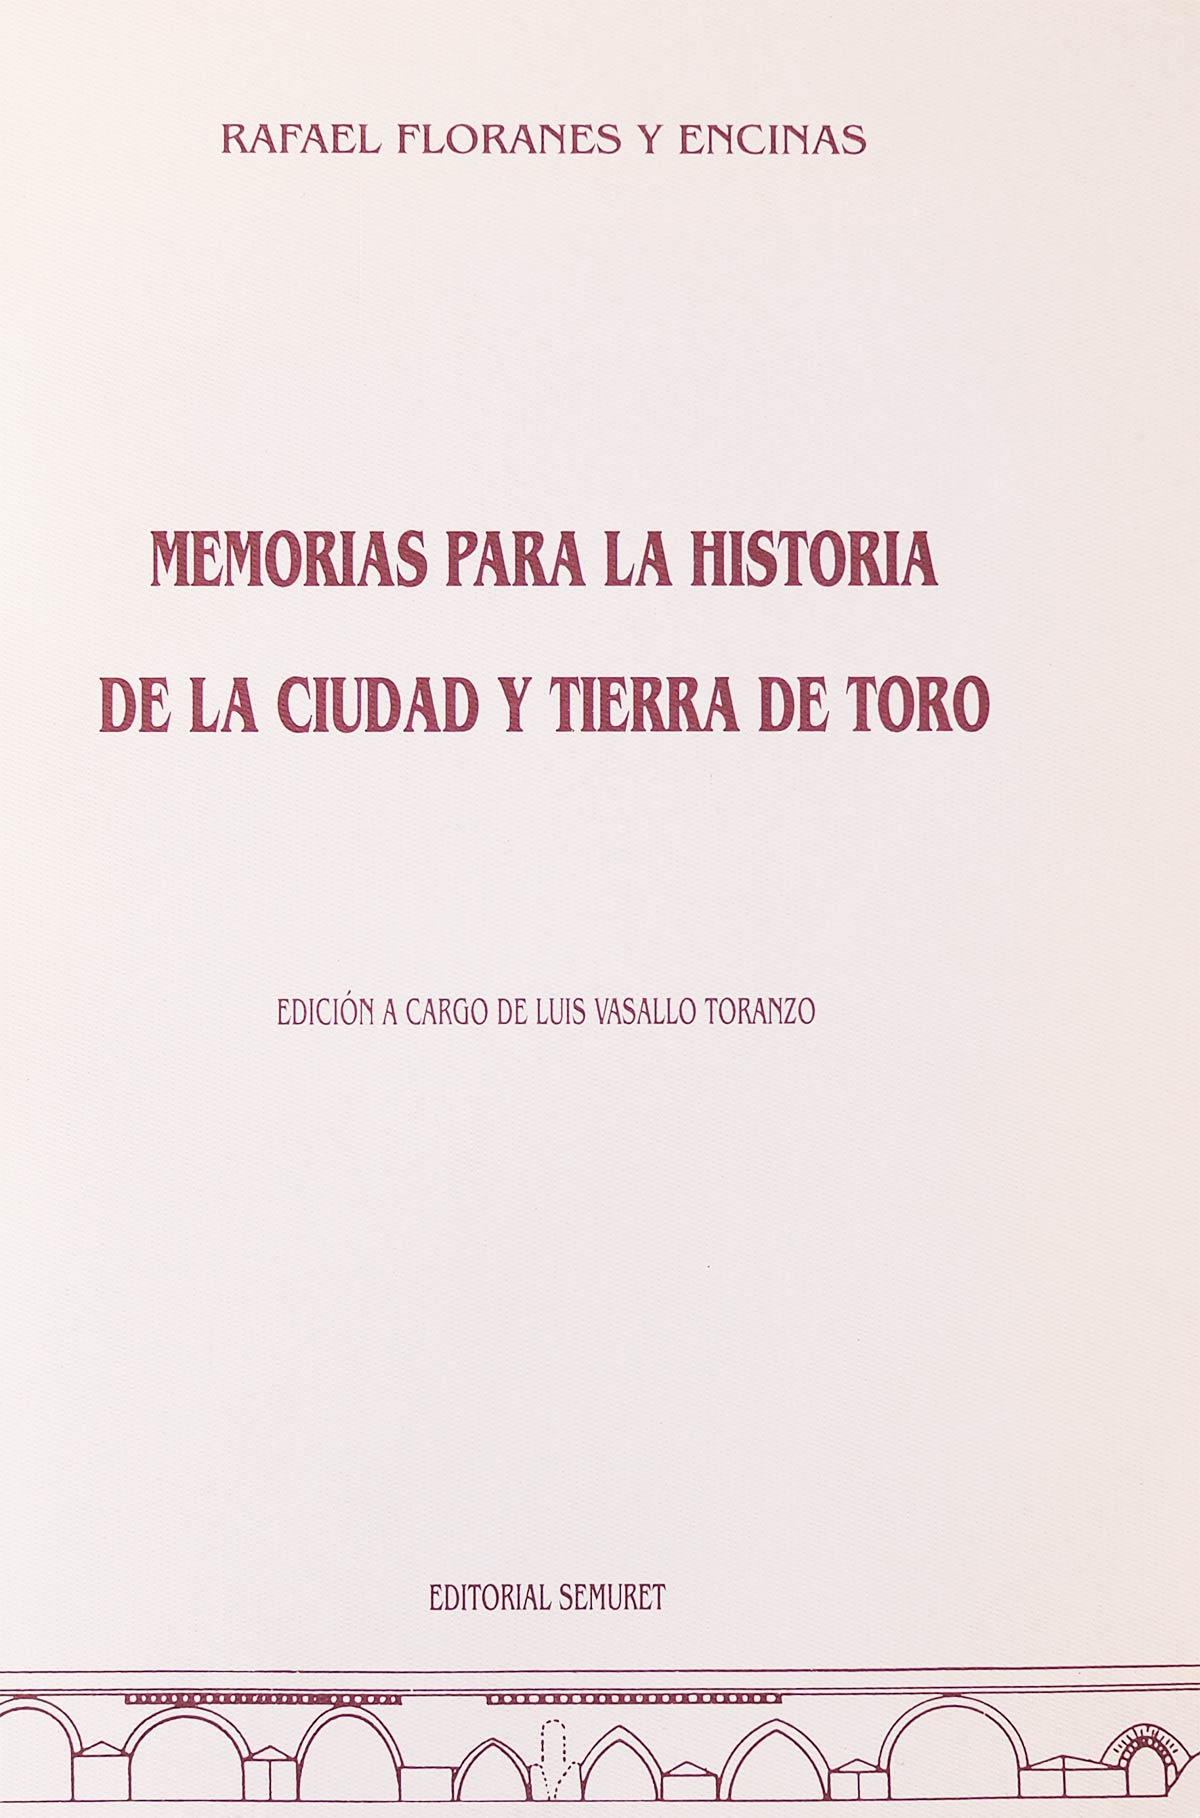 Memorias para la historia de Toro Rafael Floranes Luis Vasallo Toranzo Editorial Semuret